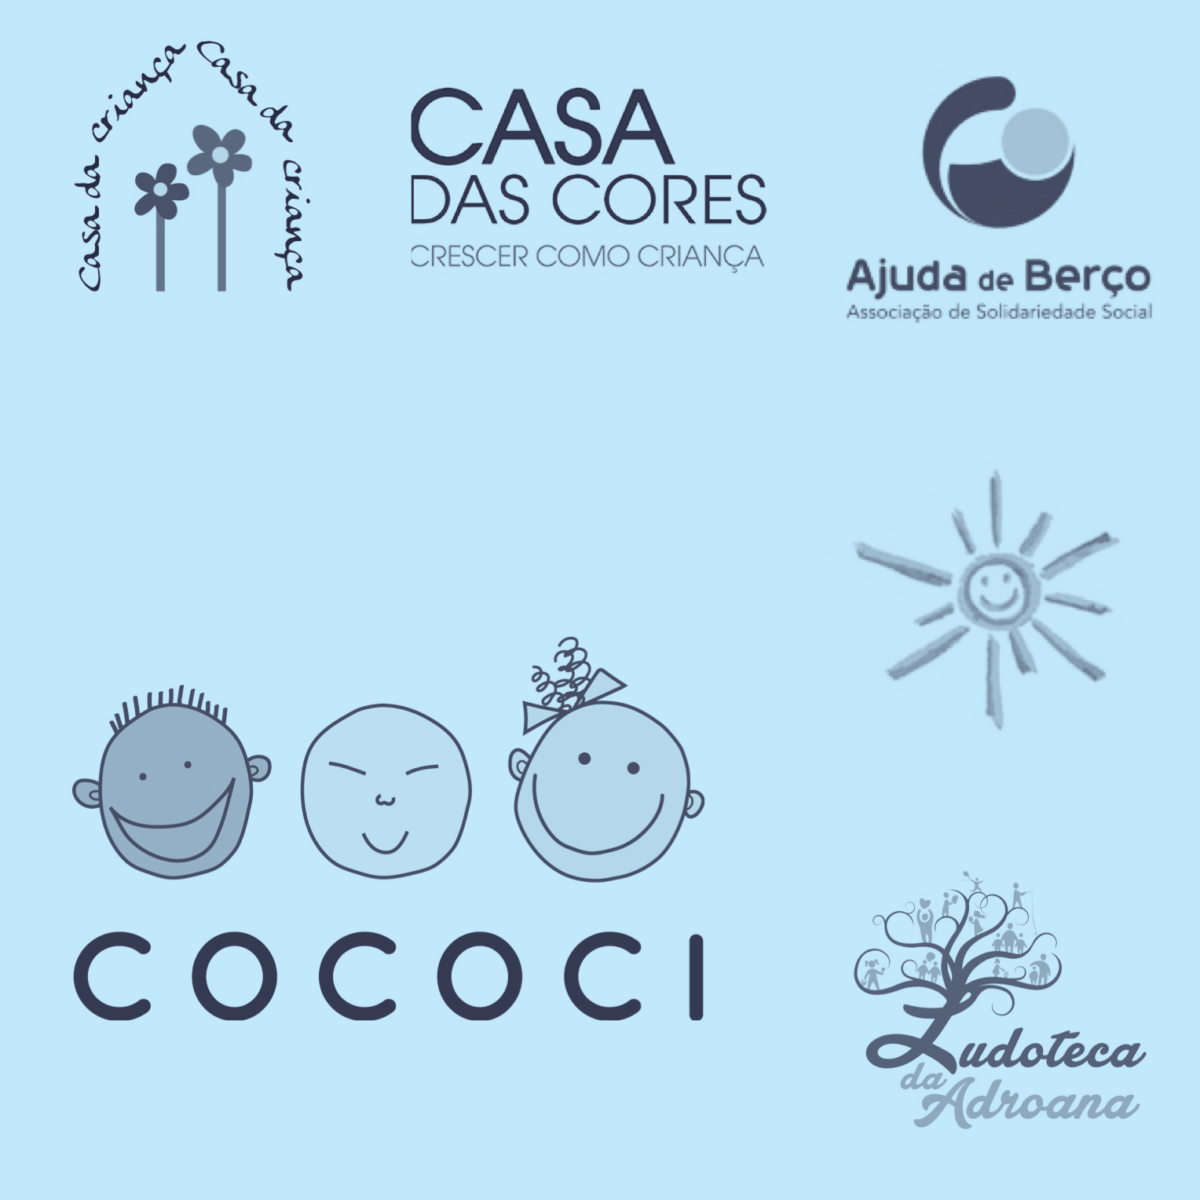 https://cococi.org/news/collaboration-avec-les-ong/ Collaboration avec les ONG